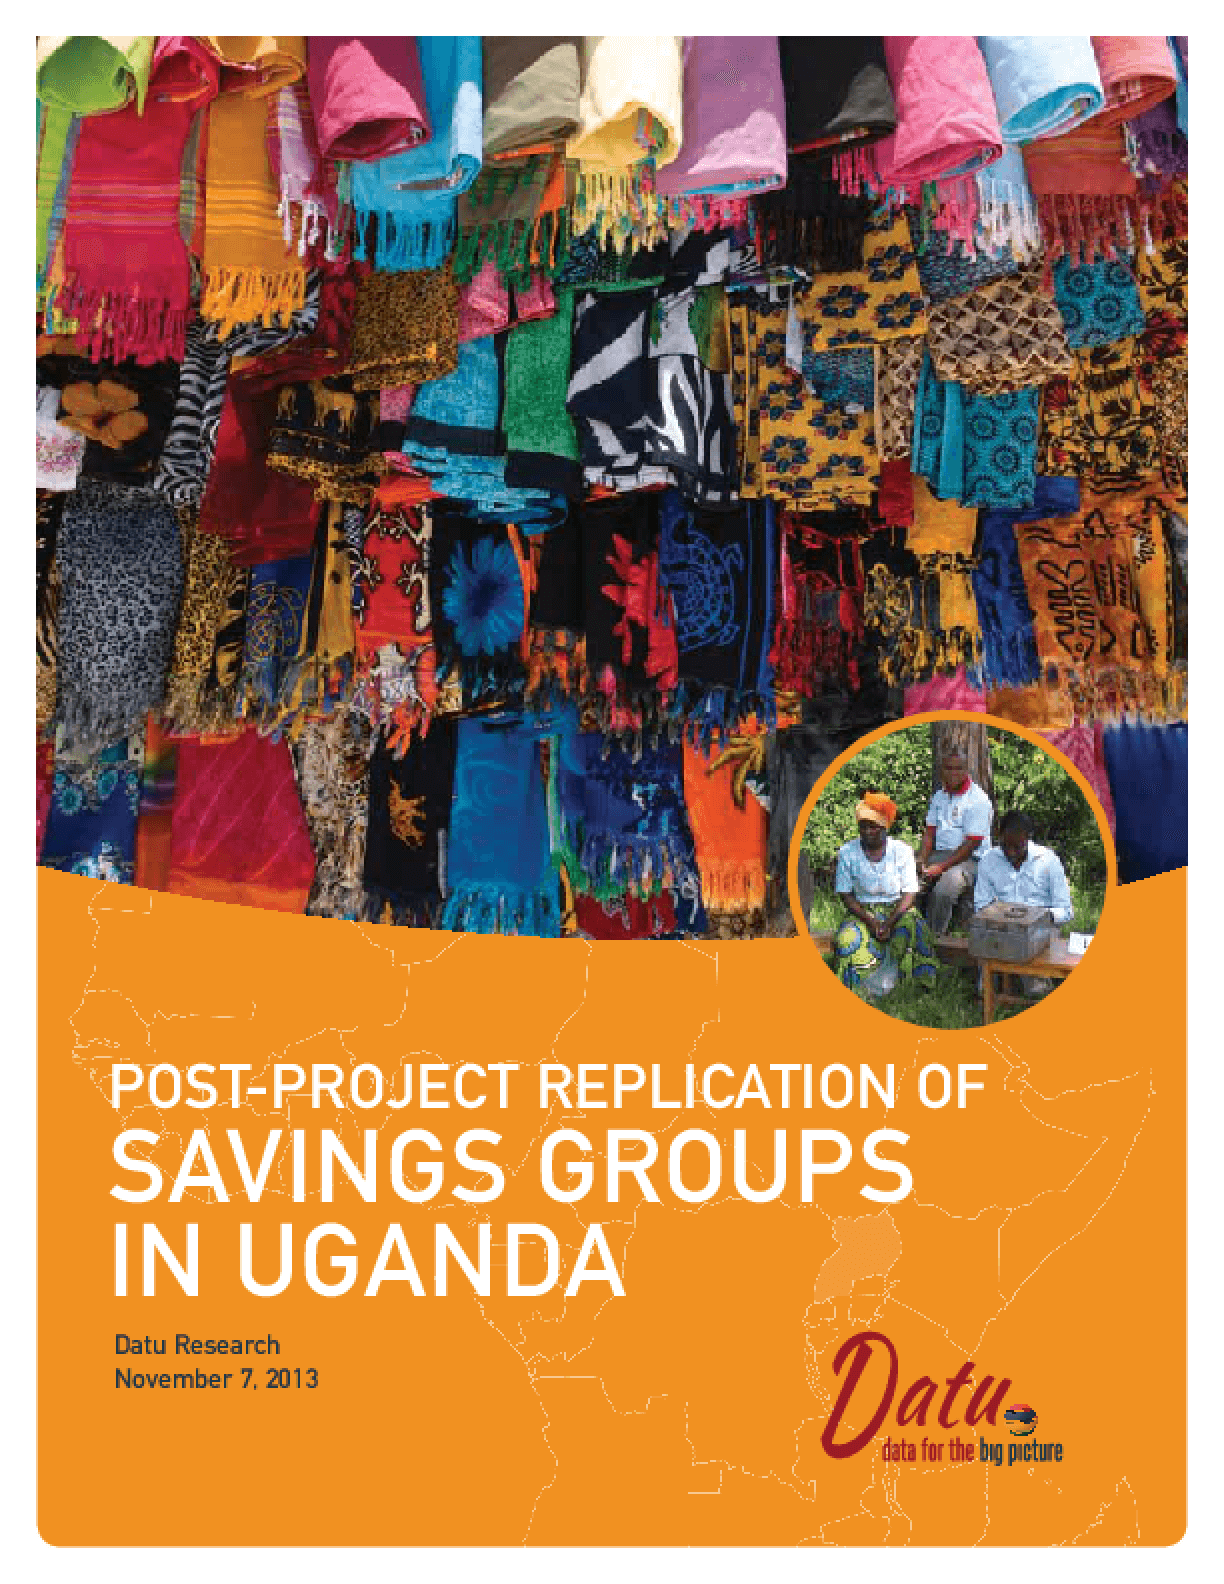 Post-Project Replication of Savings Groups in Uganda